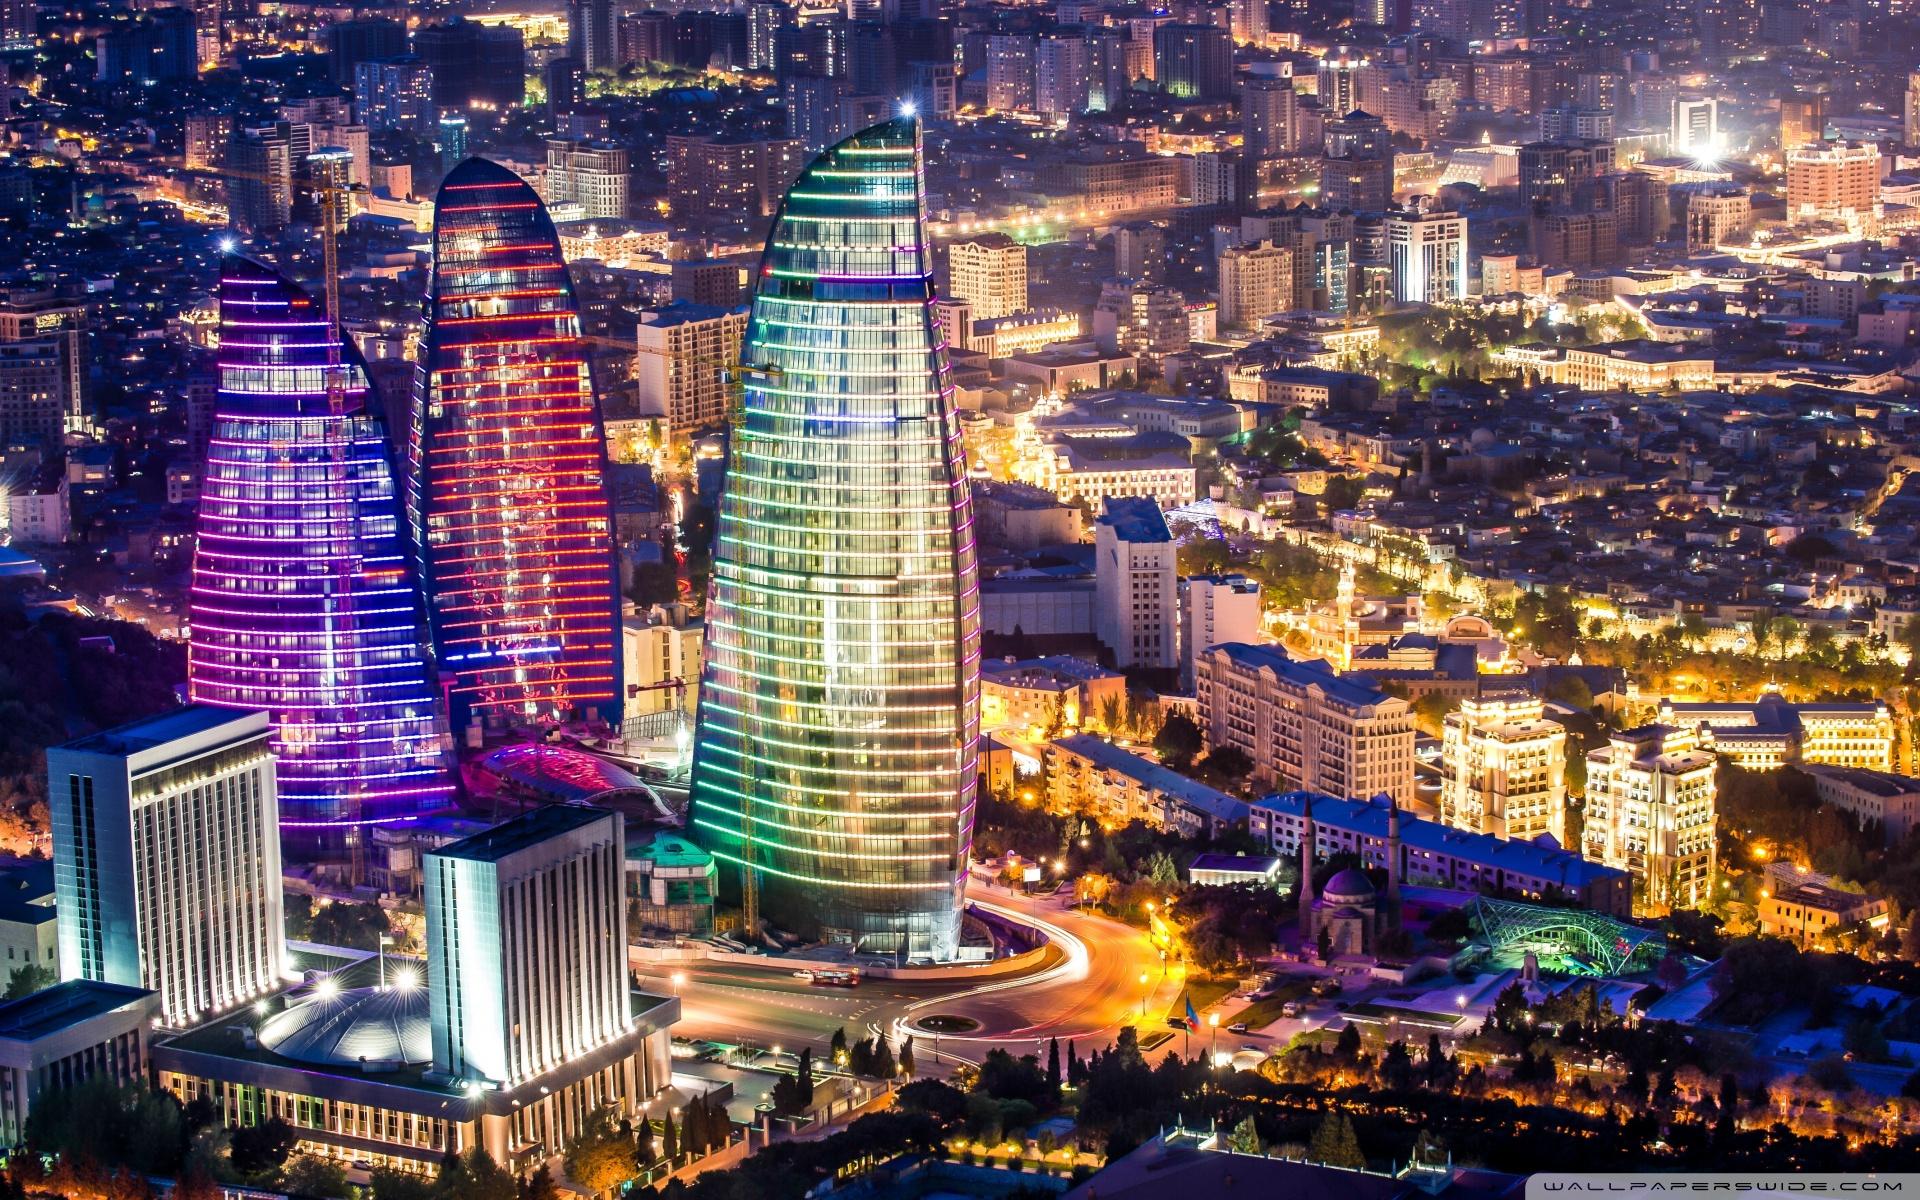 Flame Towers Baku Azerbaijan 4K HD Desktop Wallpaper for 1920x1200